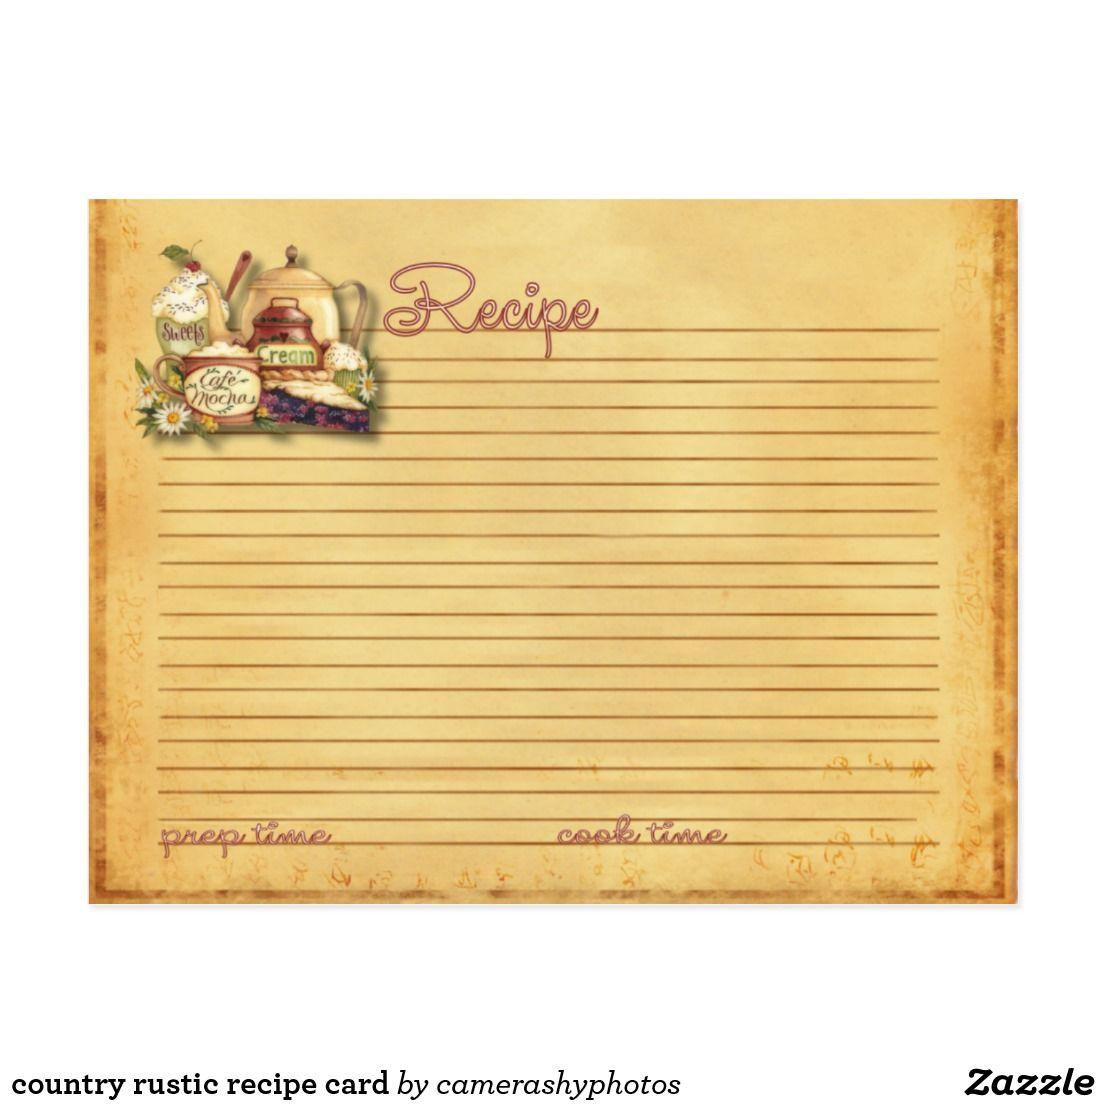 country rustic recipe card